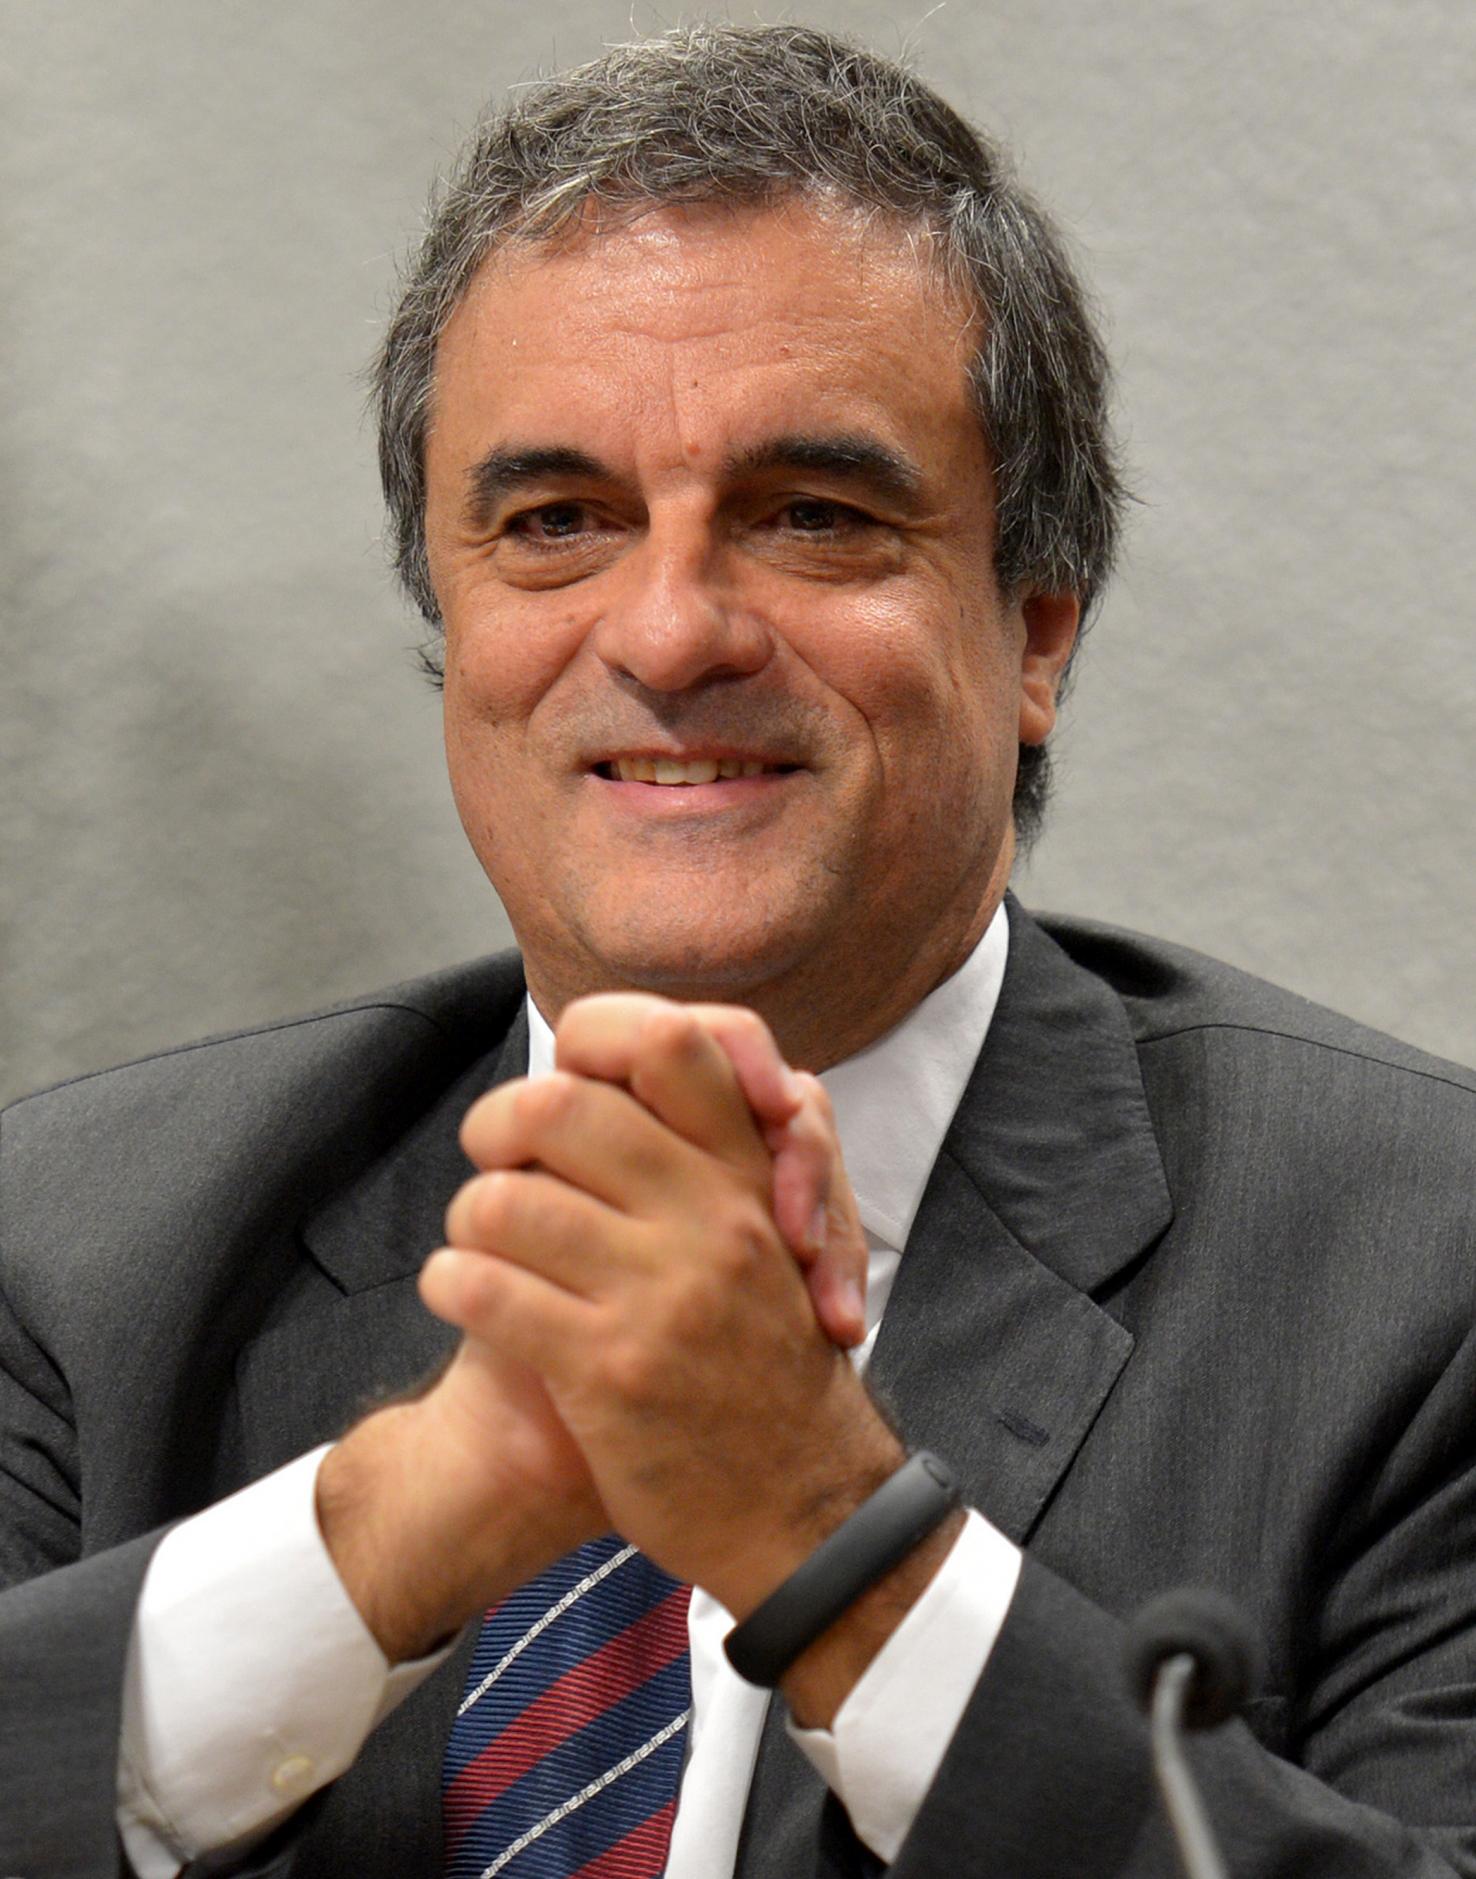 https://upload.wikimedia.org/wikipedia/commons/9/90/Jose_Eduardo_Cardozo_15mai2013.jpg